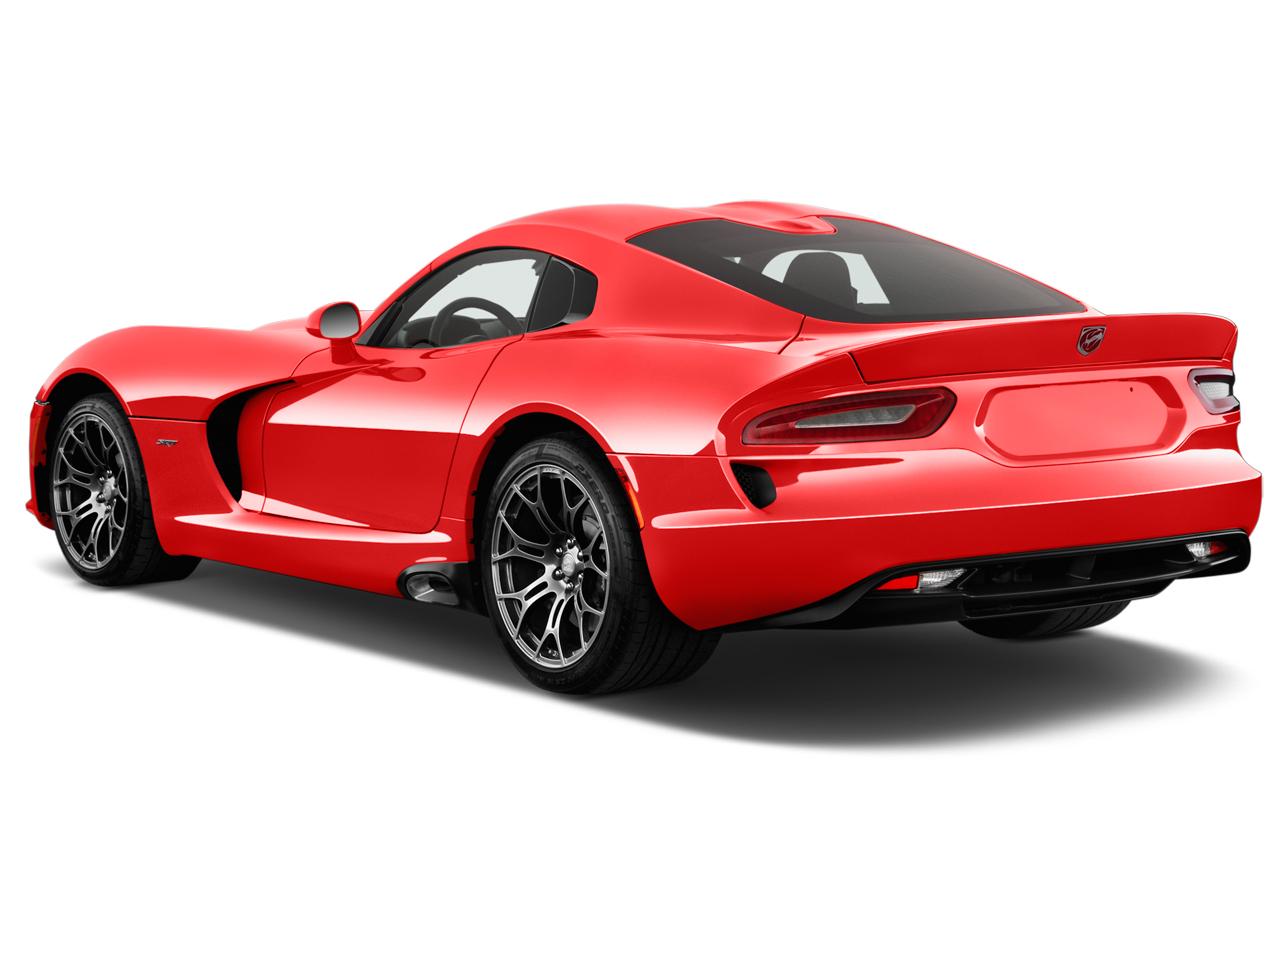 dodge viper 2018 8 4l gts in saudi arabia new car prices specs reviews photos yallamotor. Black Bedroom Furniture Sets. Home Design Ideas